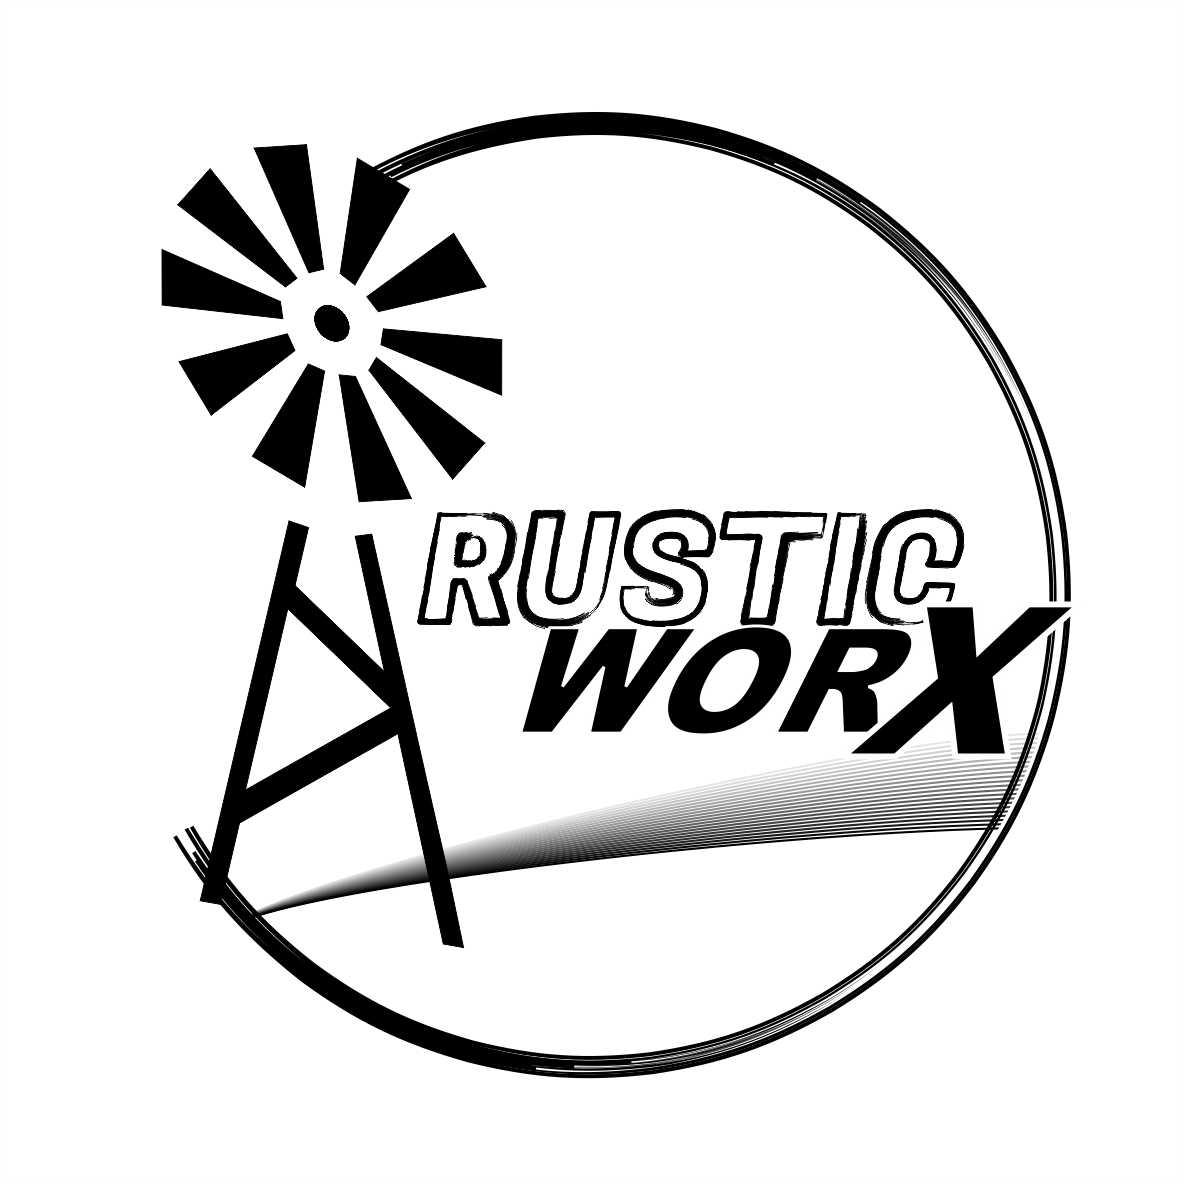 Rusticworx Logo